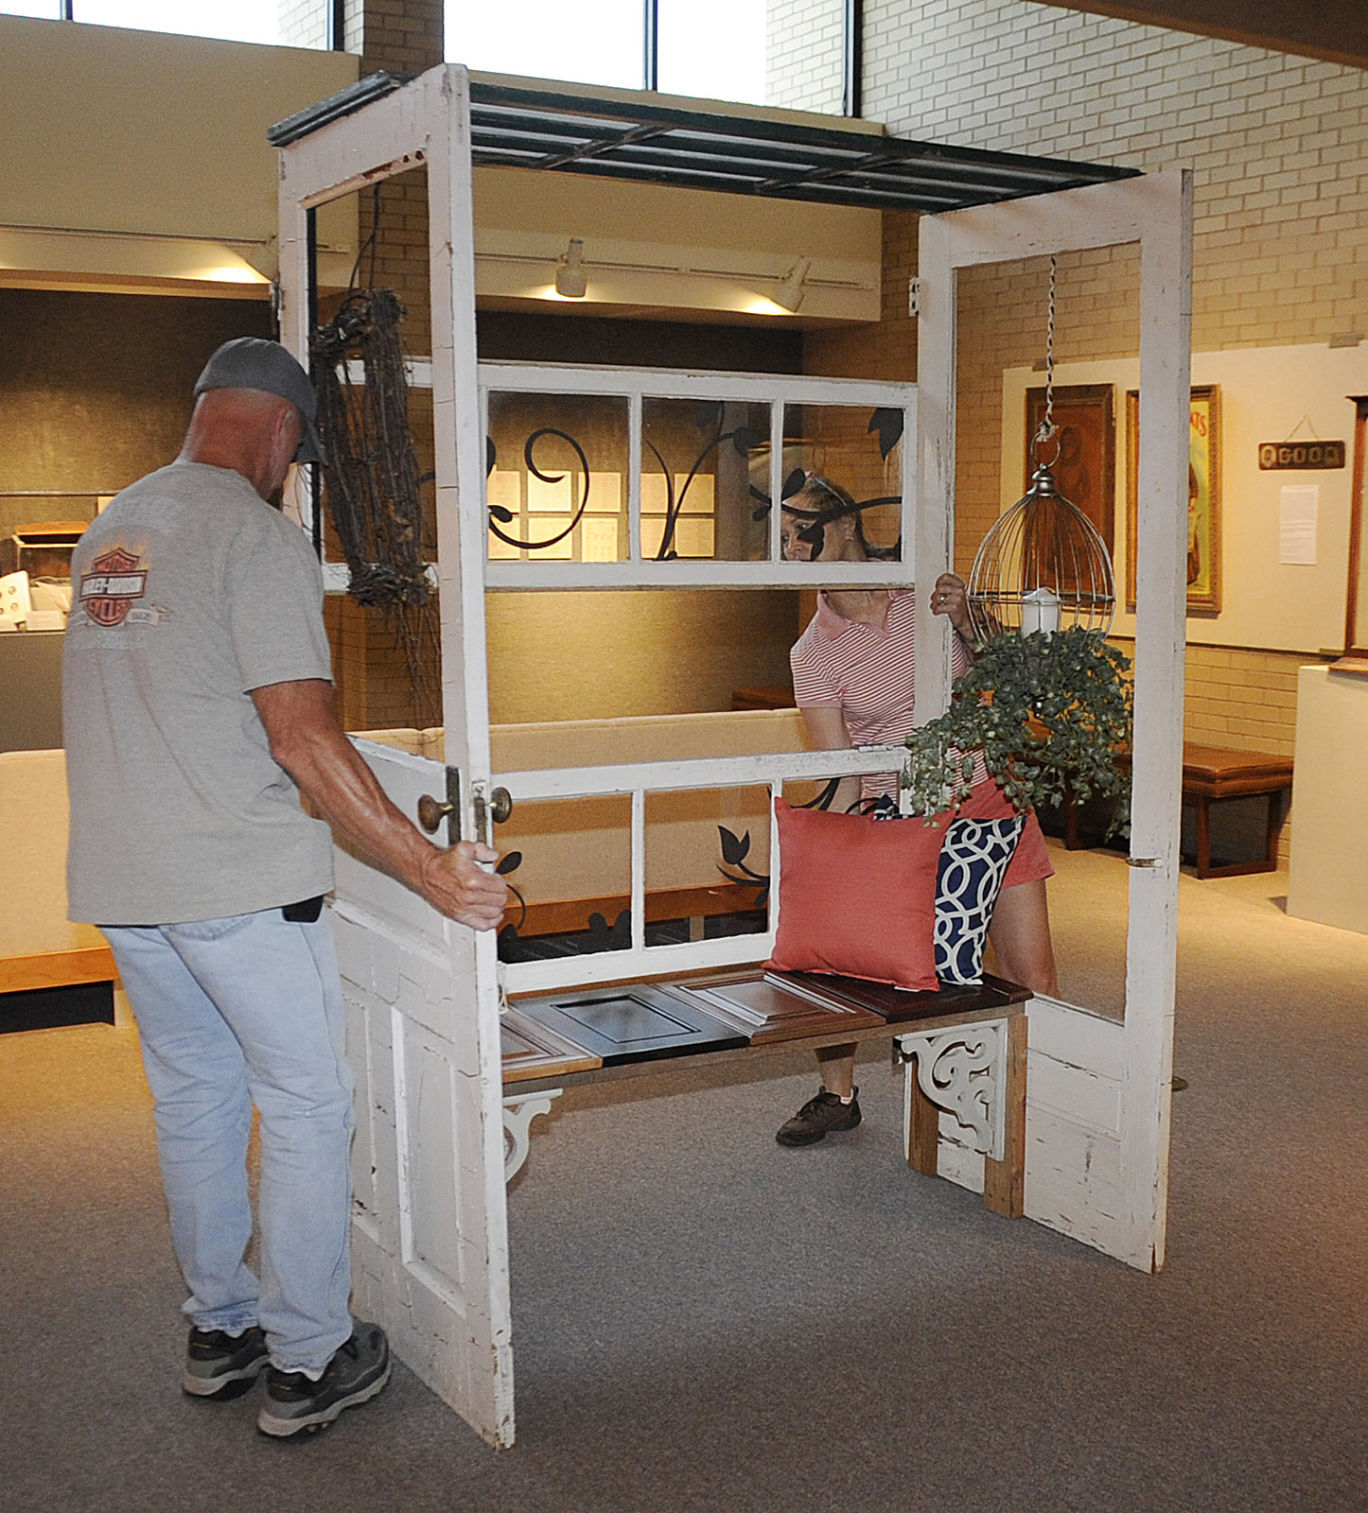 MAC reimagined Cooper Exhibition of repurposed doors